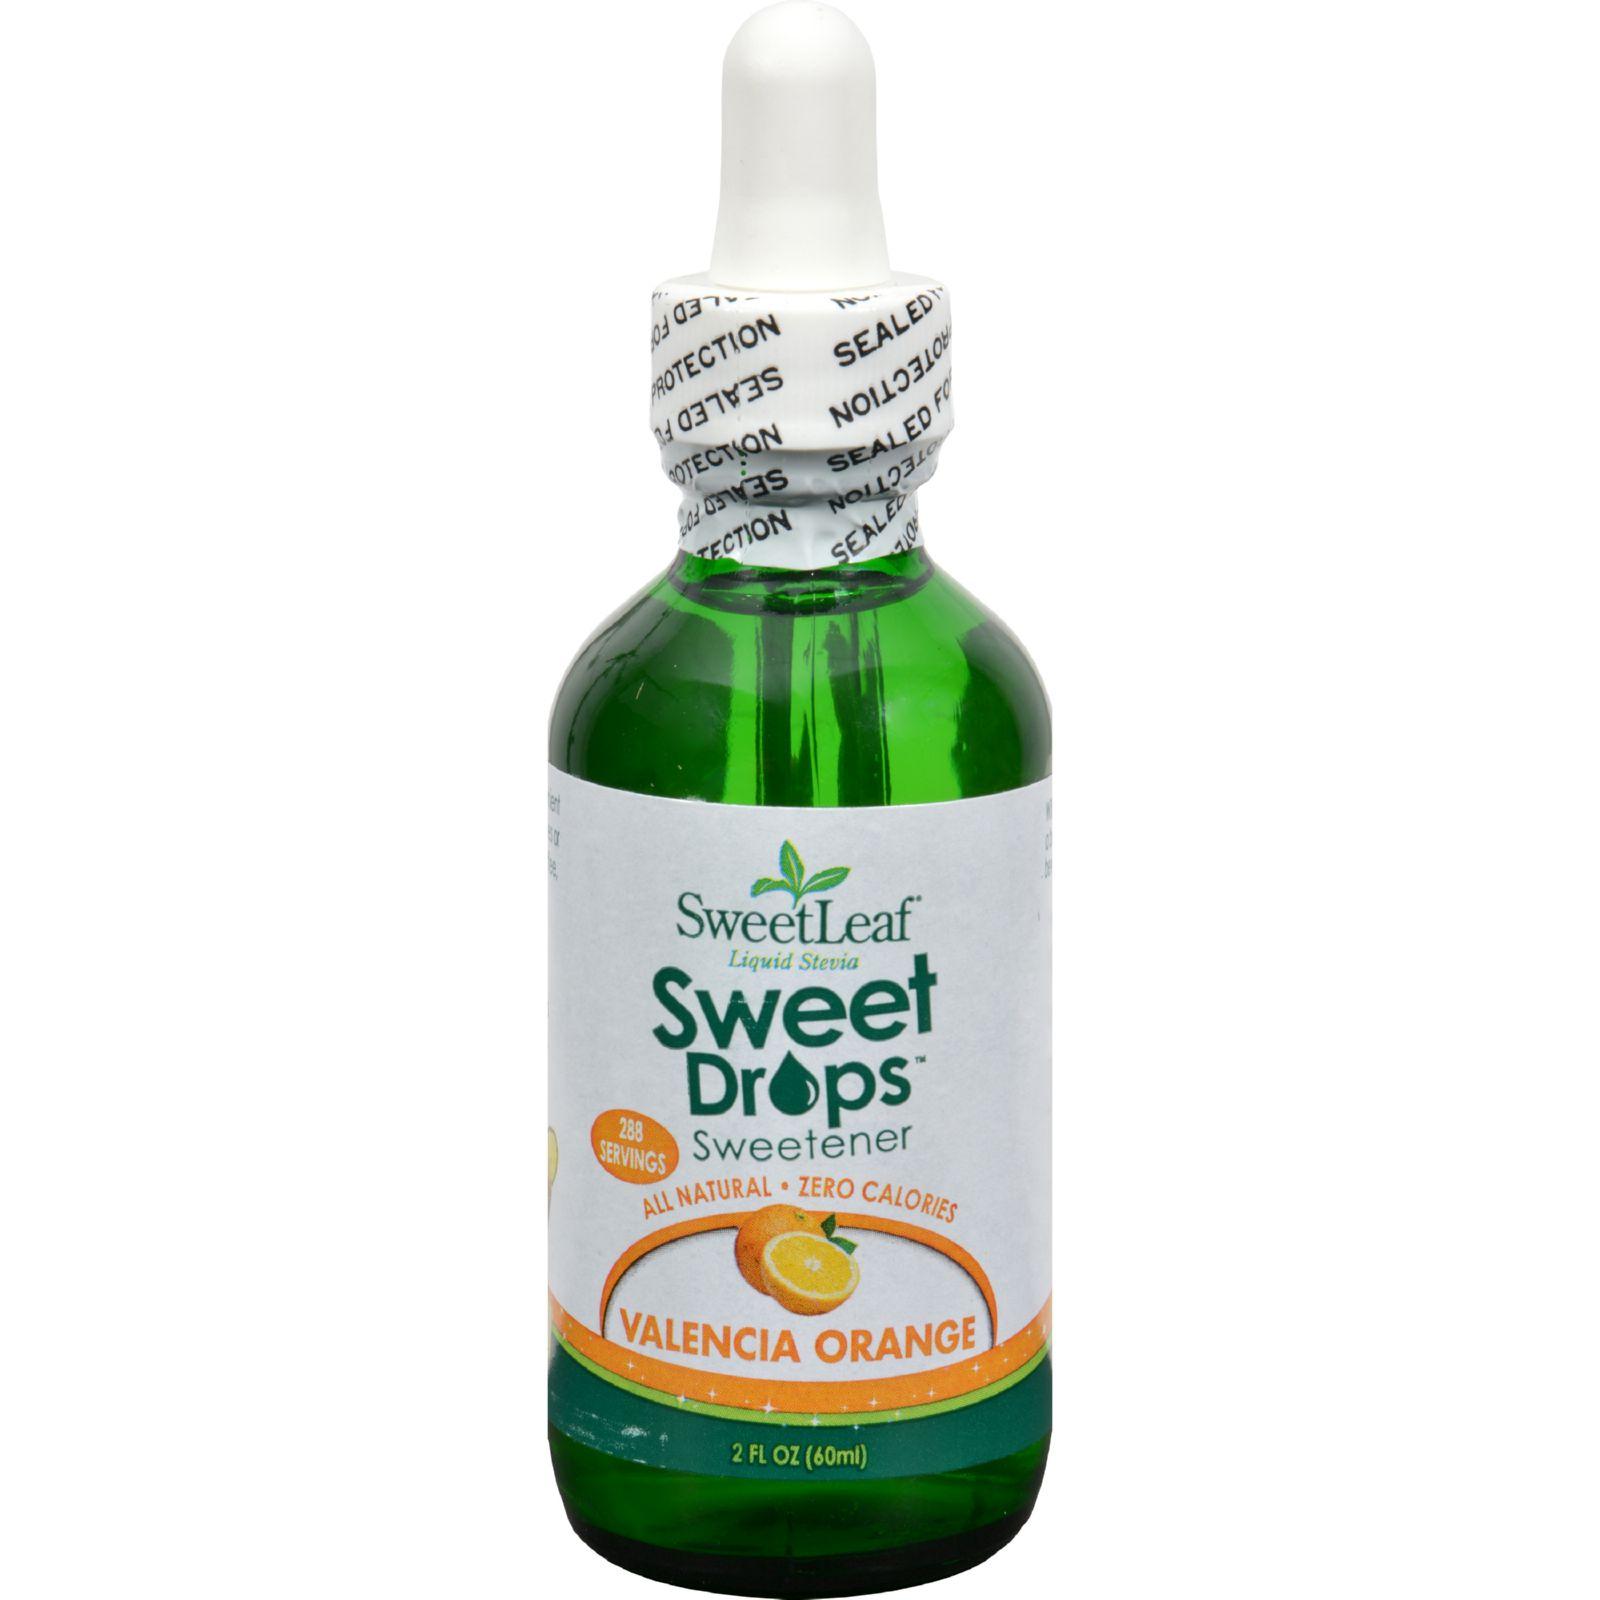 Sweet Drops Sweetener Valencia Orange - 2 fl oz